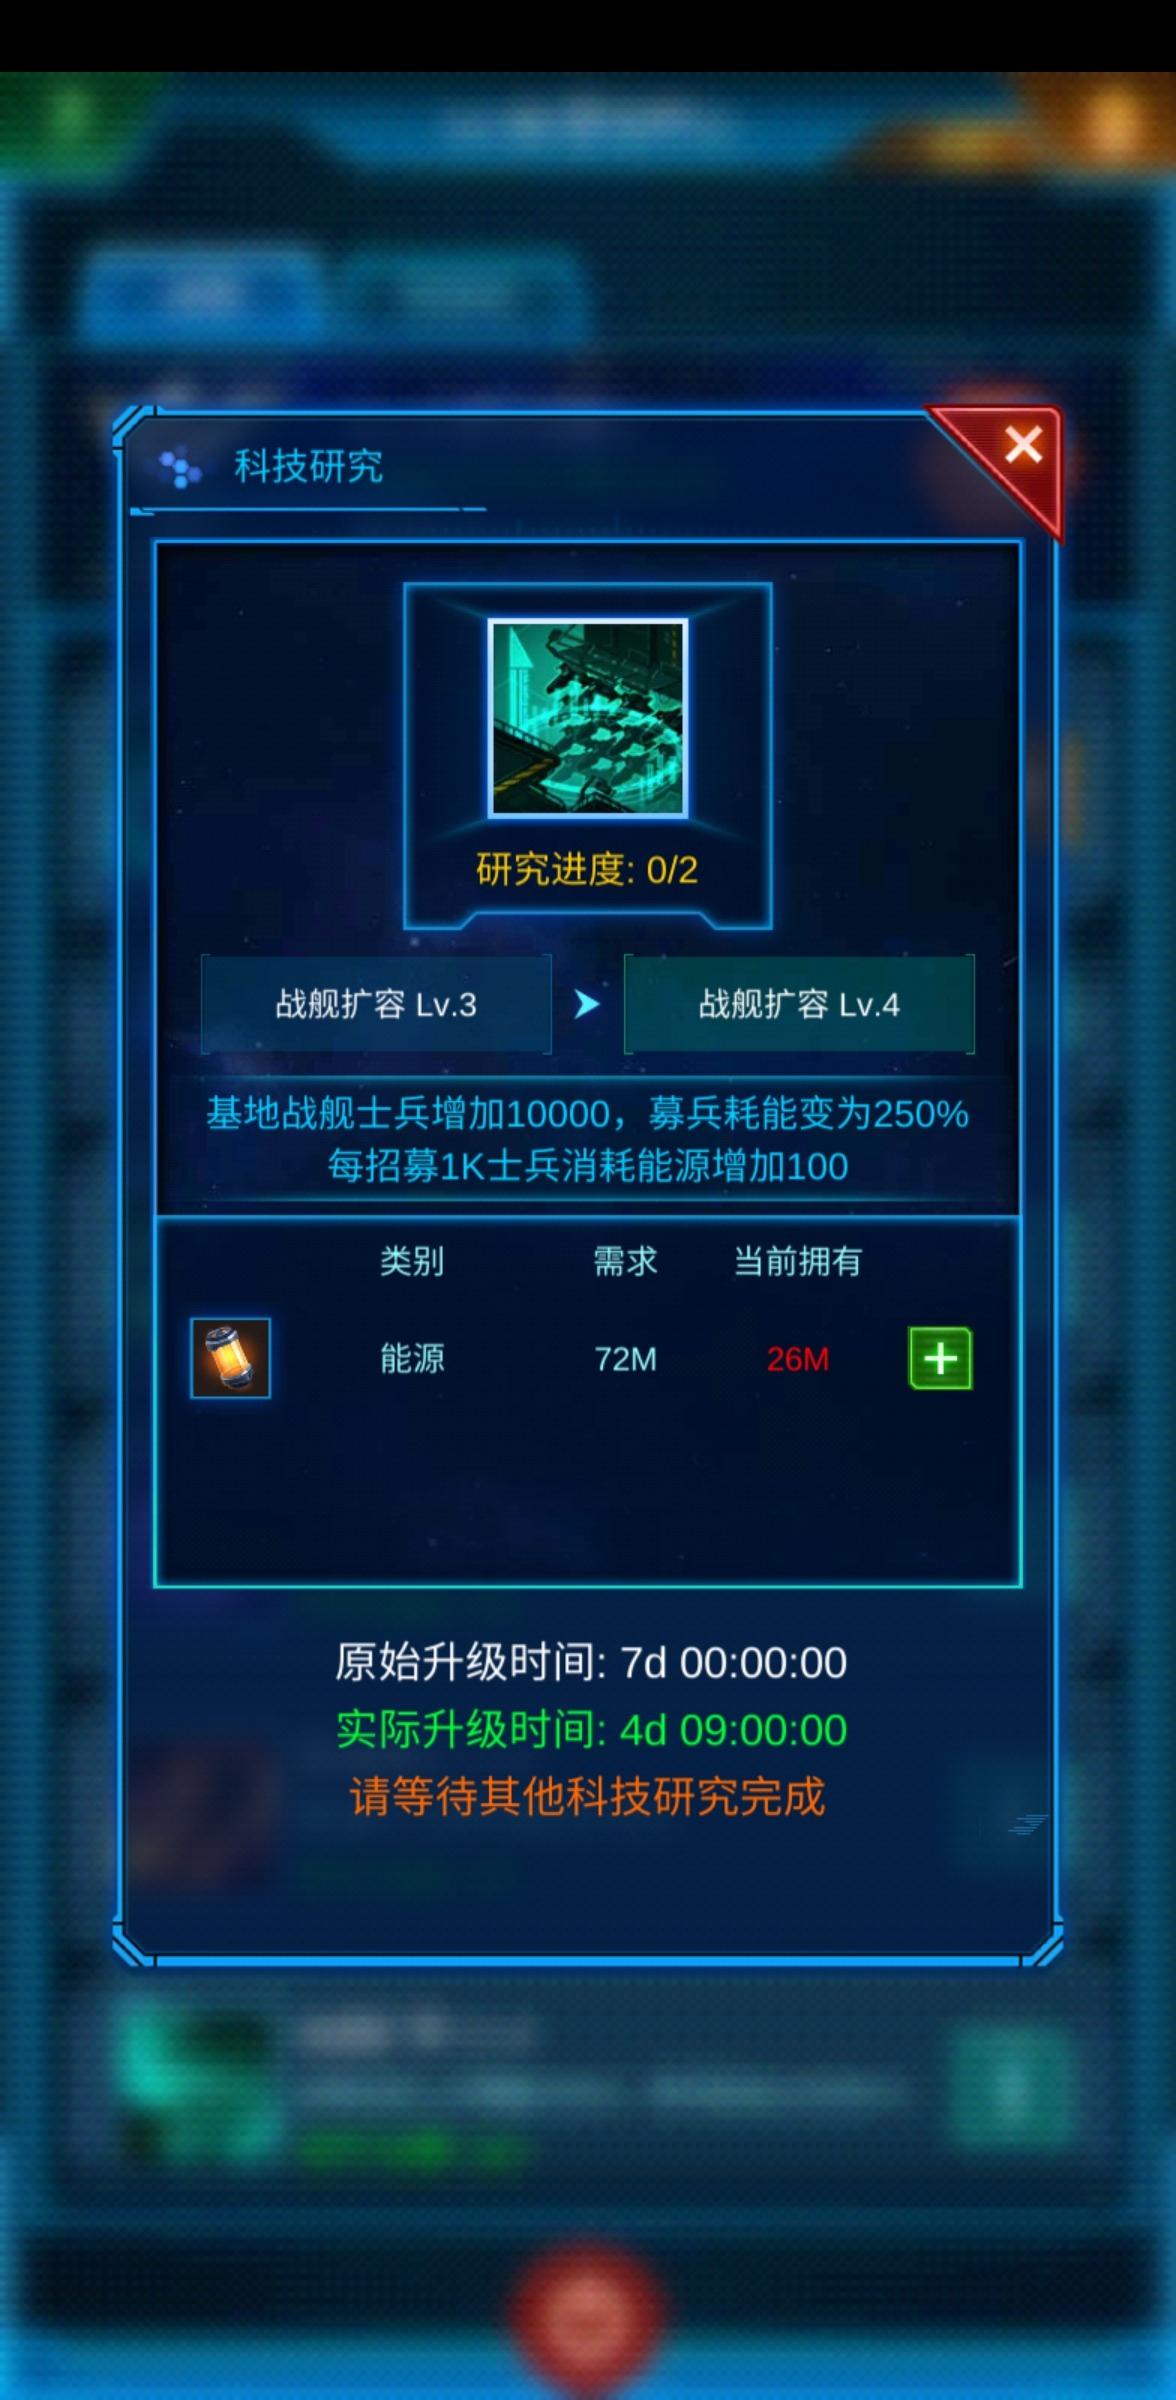 Screenshot_20200320_161059_com.jedigames.p16s.huawei.jpg